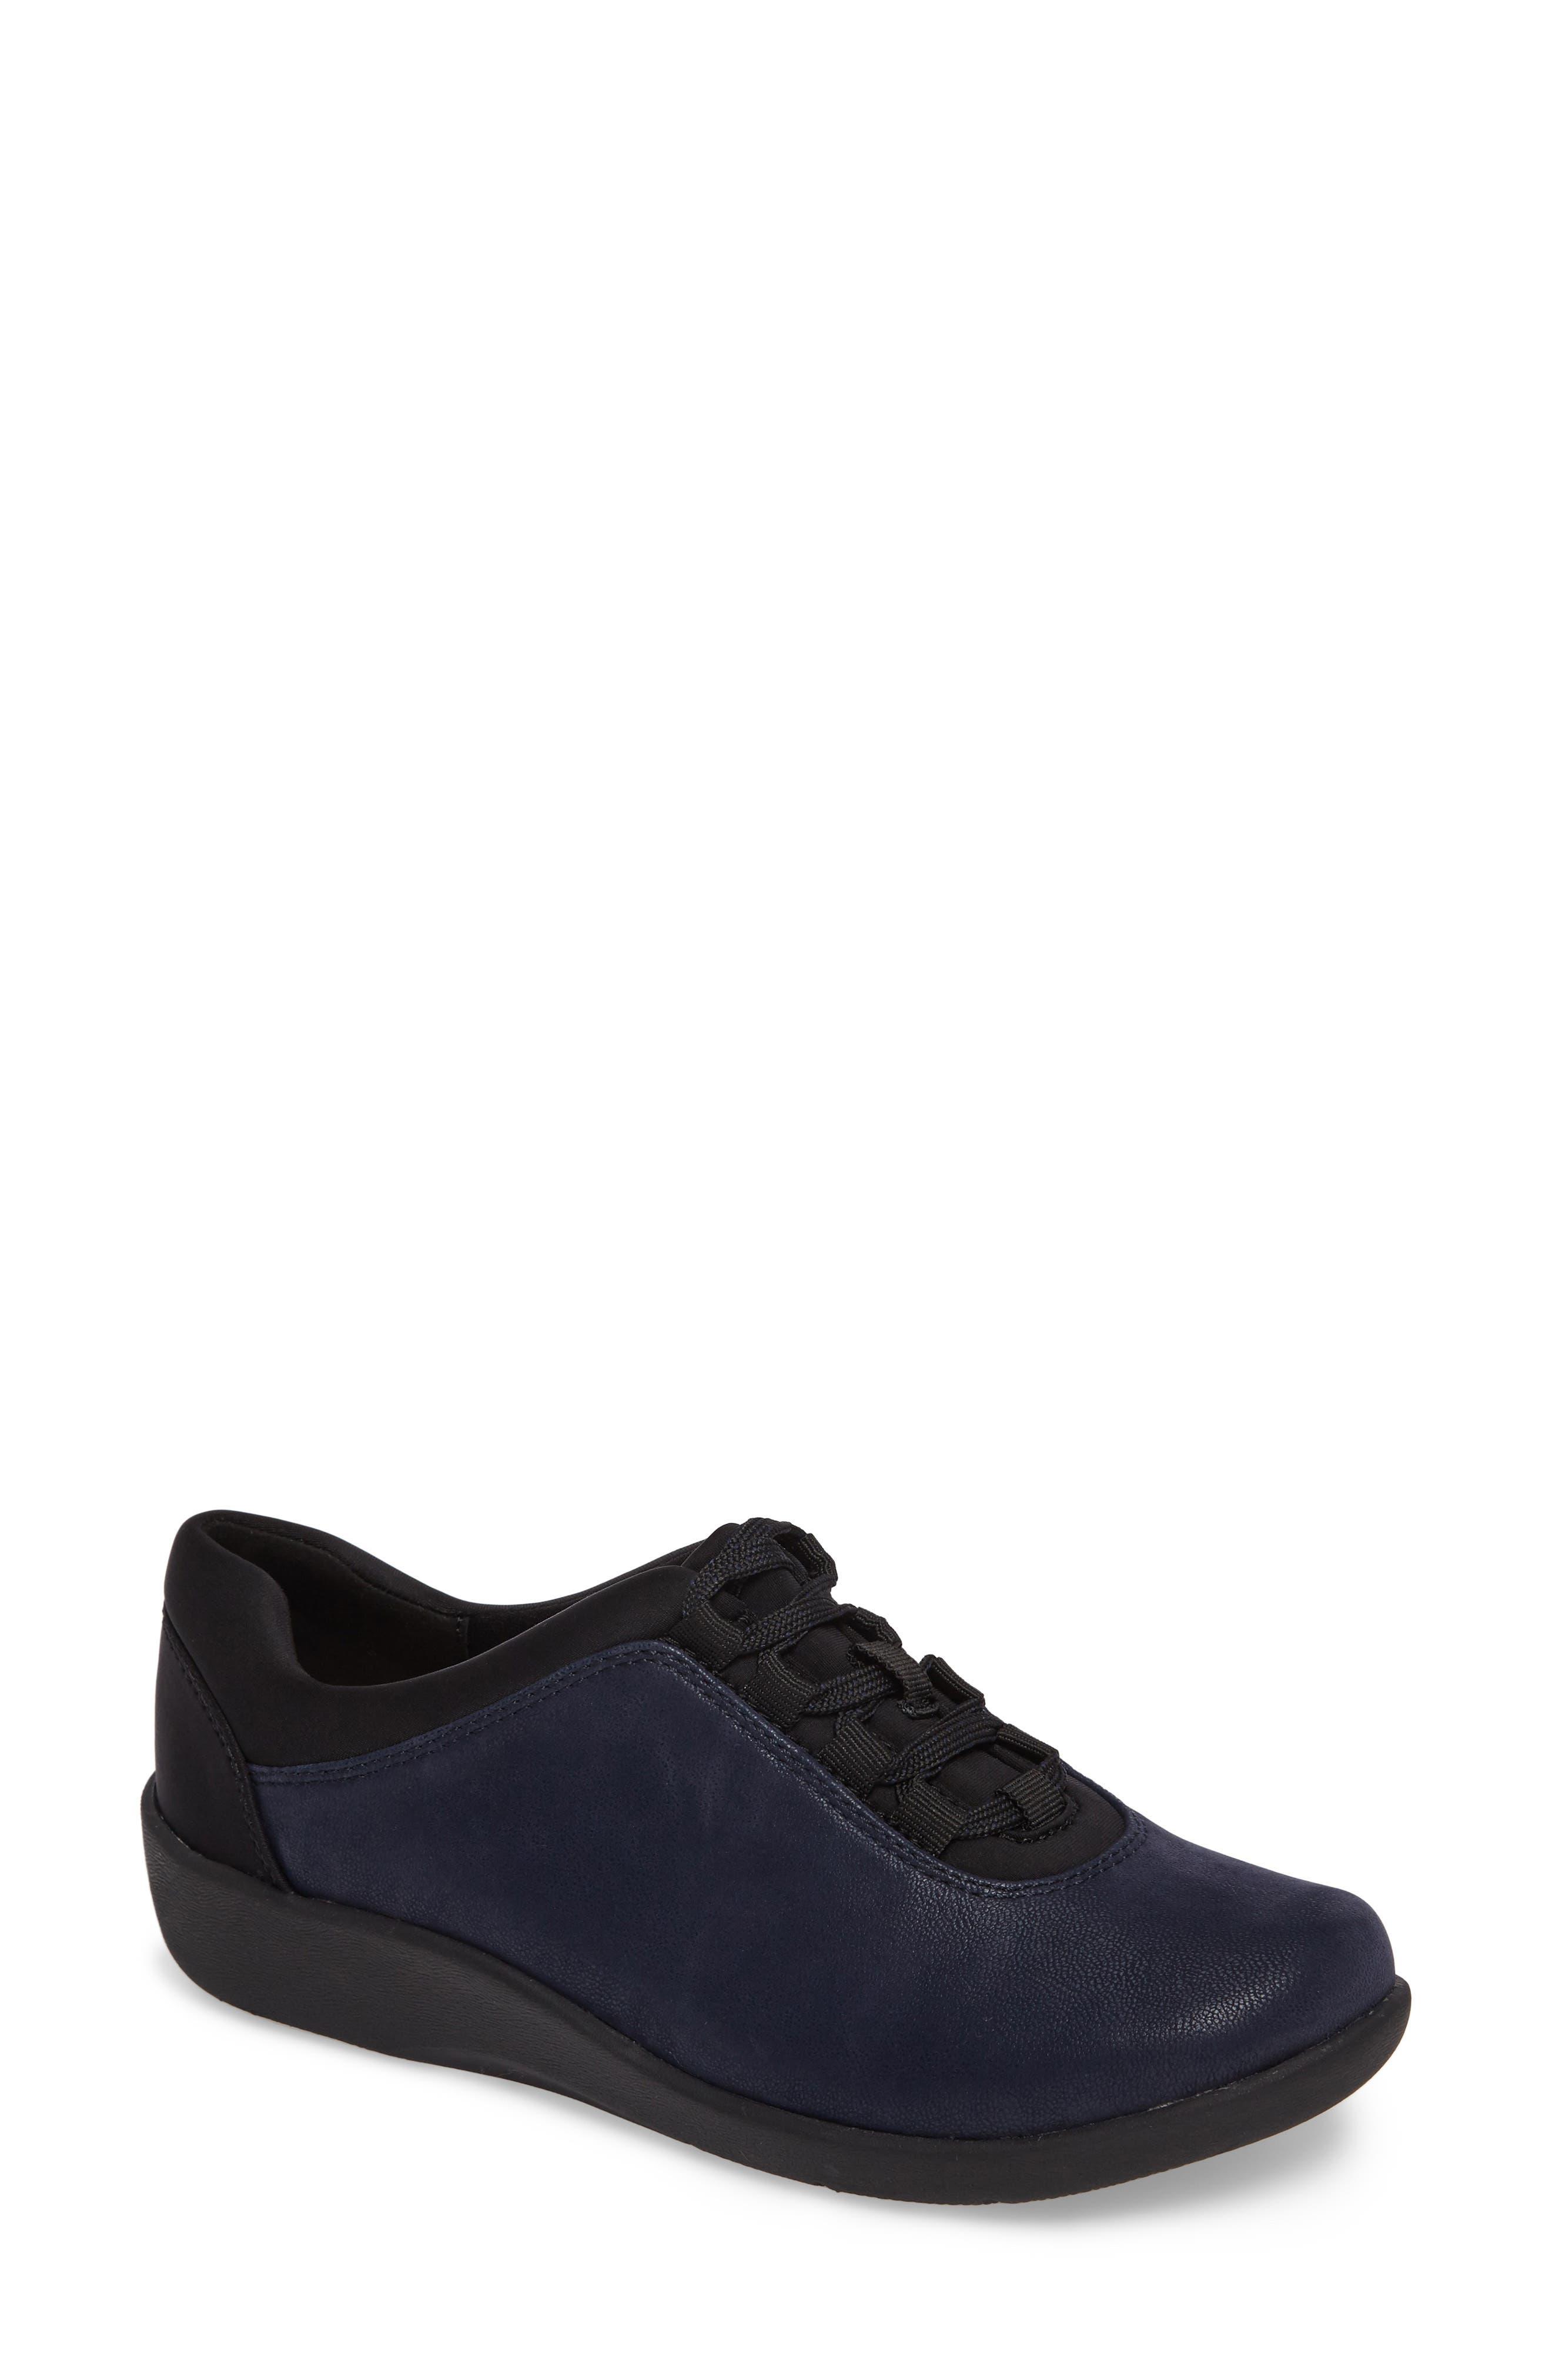 Sillian Pine Sneaker,                         Main,                         color, Navy Canvas